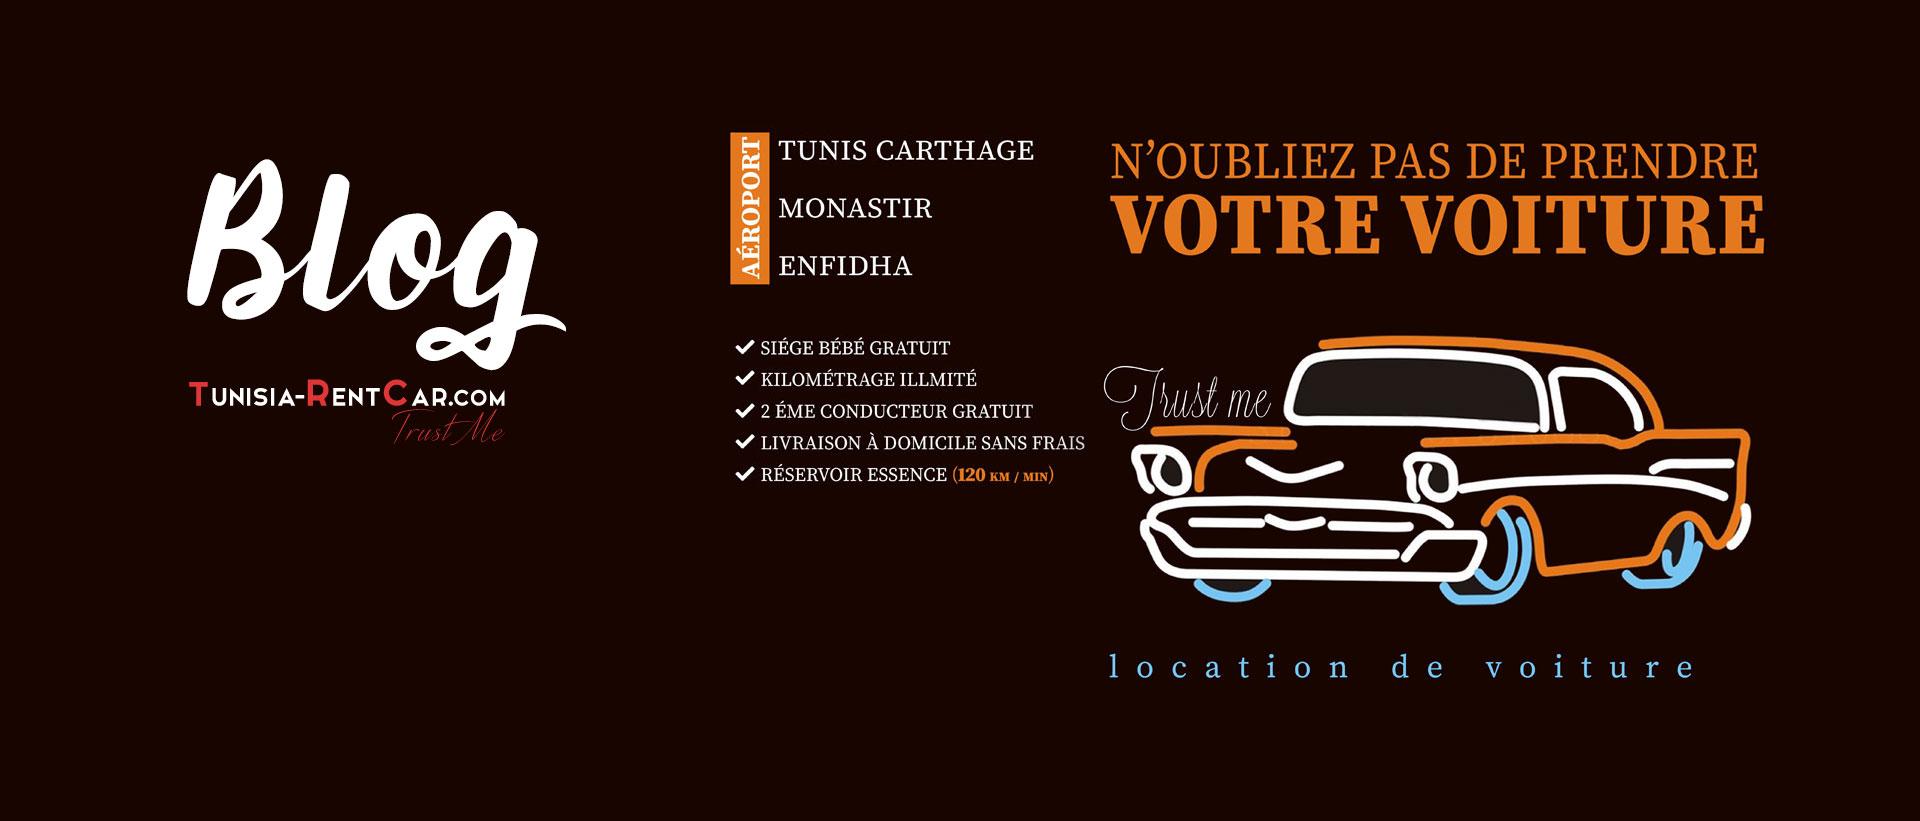 Blog Tunisia Rentcar